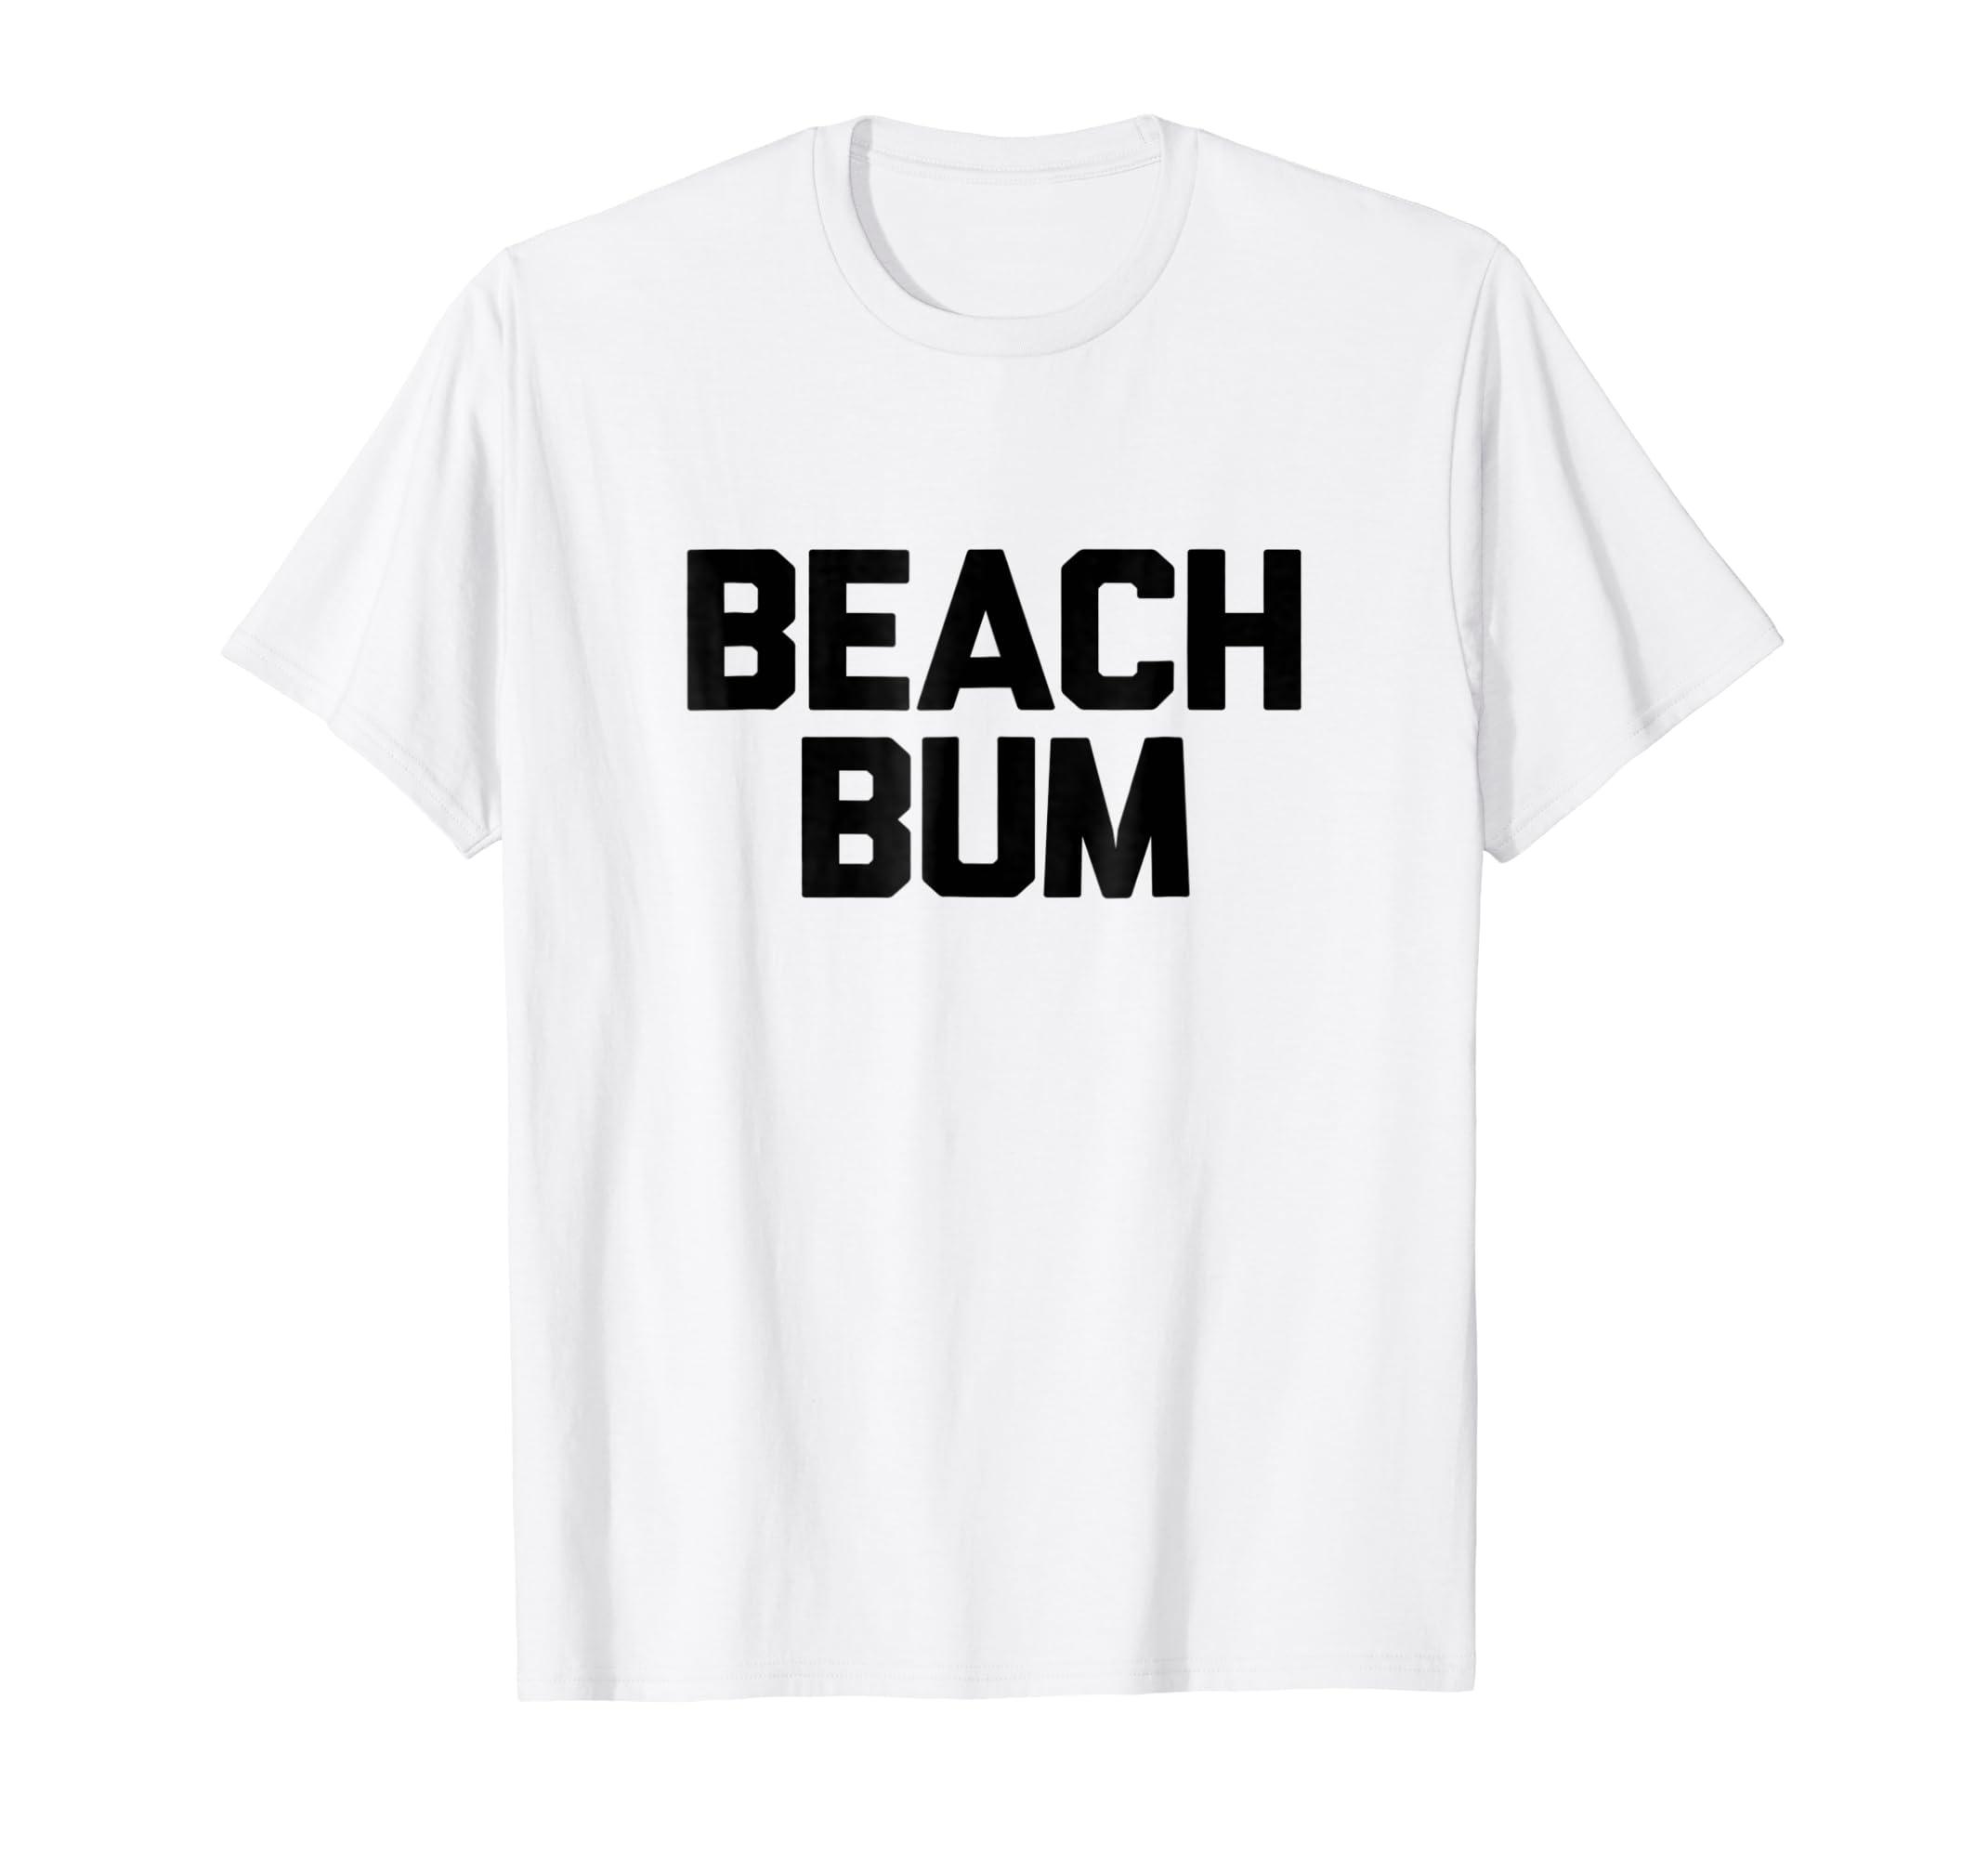 96ed3e578 Amazon.com: Beach Bum T-Shirt Funny Sarcastic Novelty Summer Gifts: Clothing